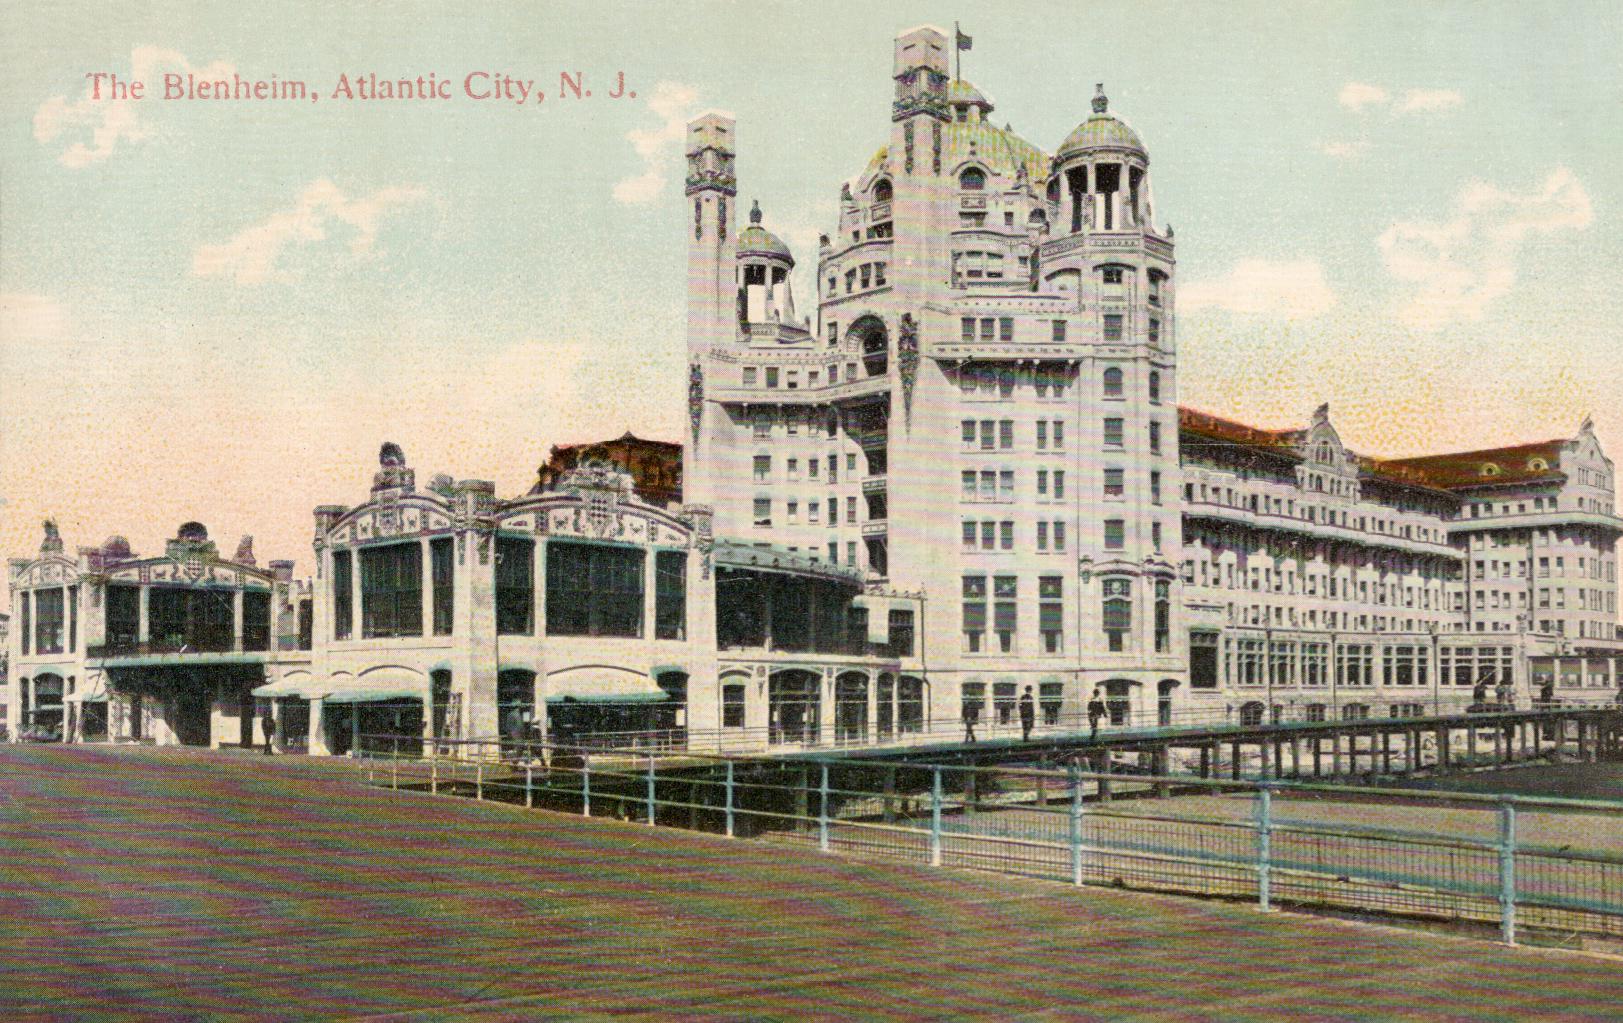 Boardwalk Empire Hotel Atlantic City